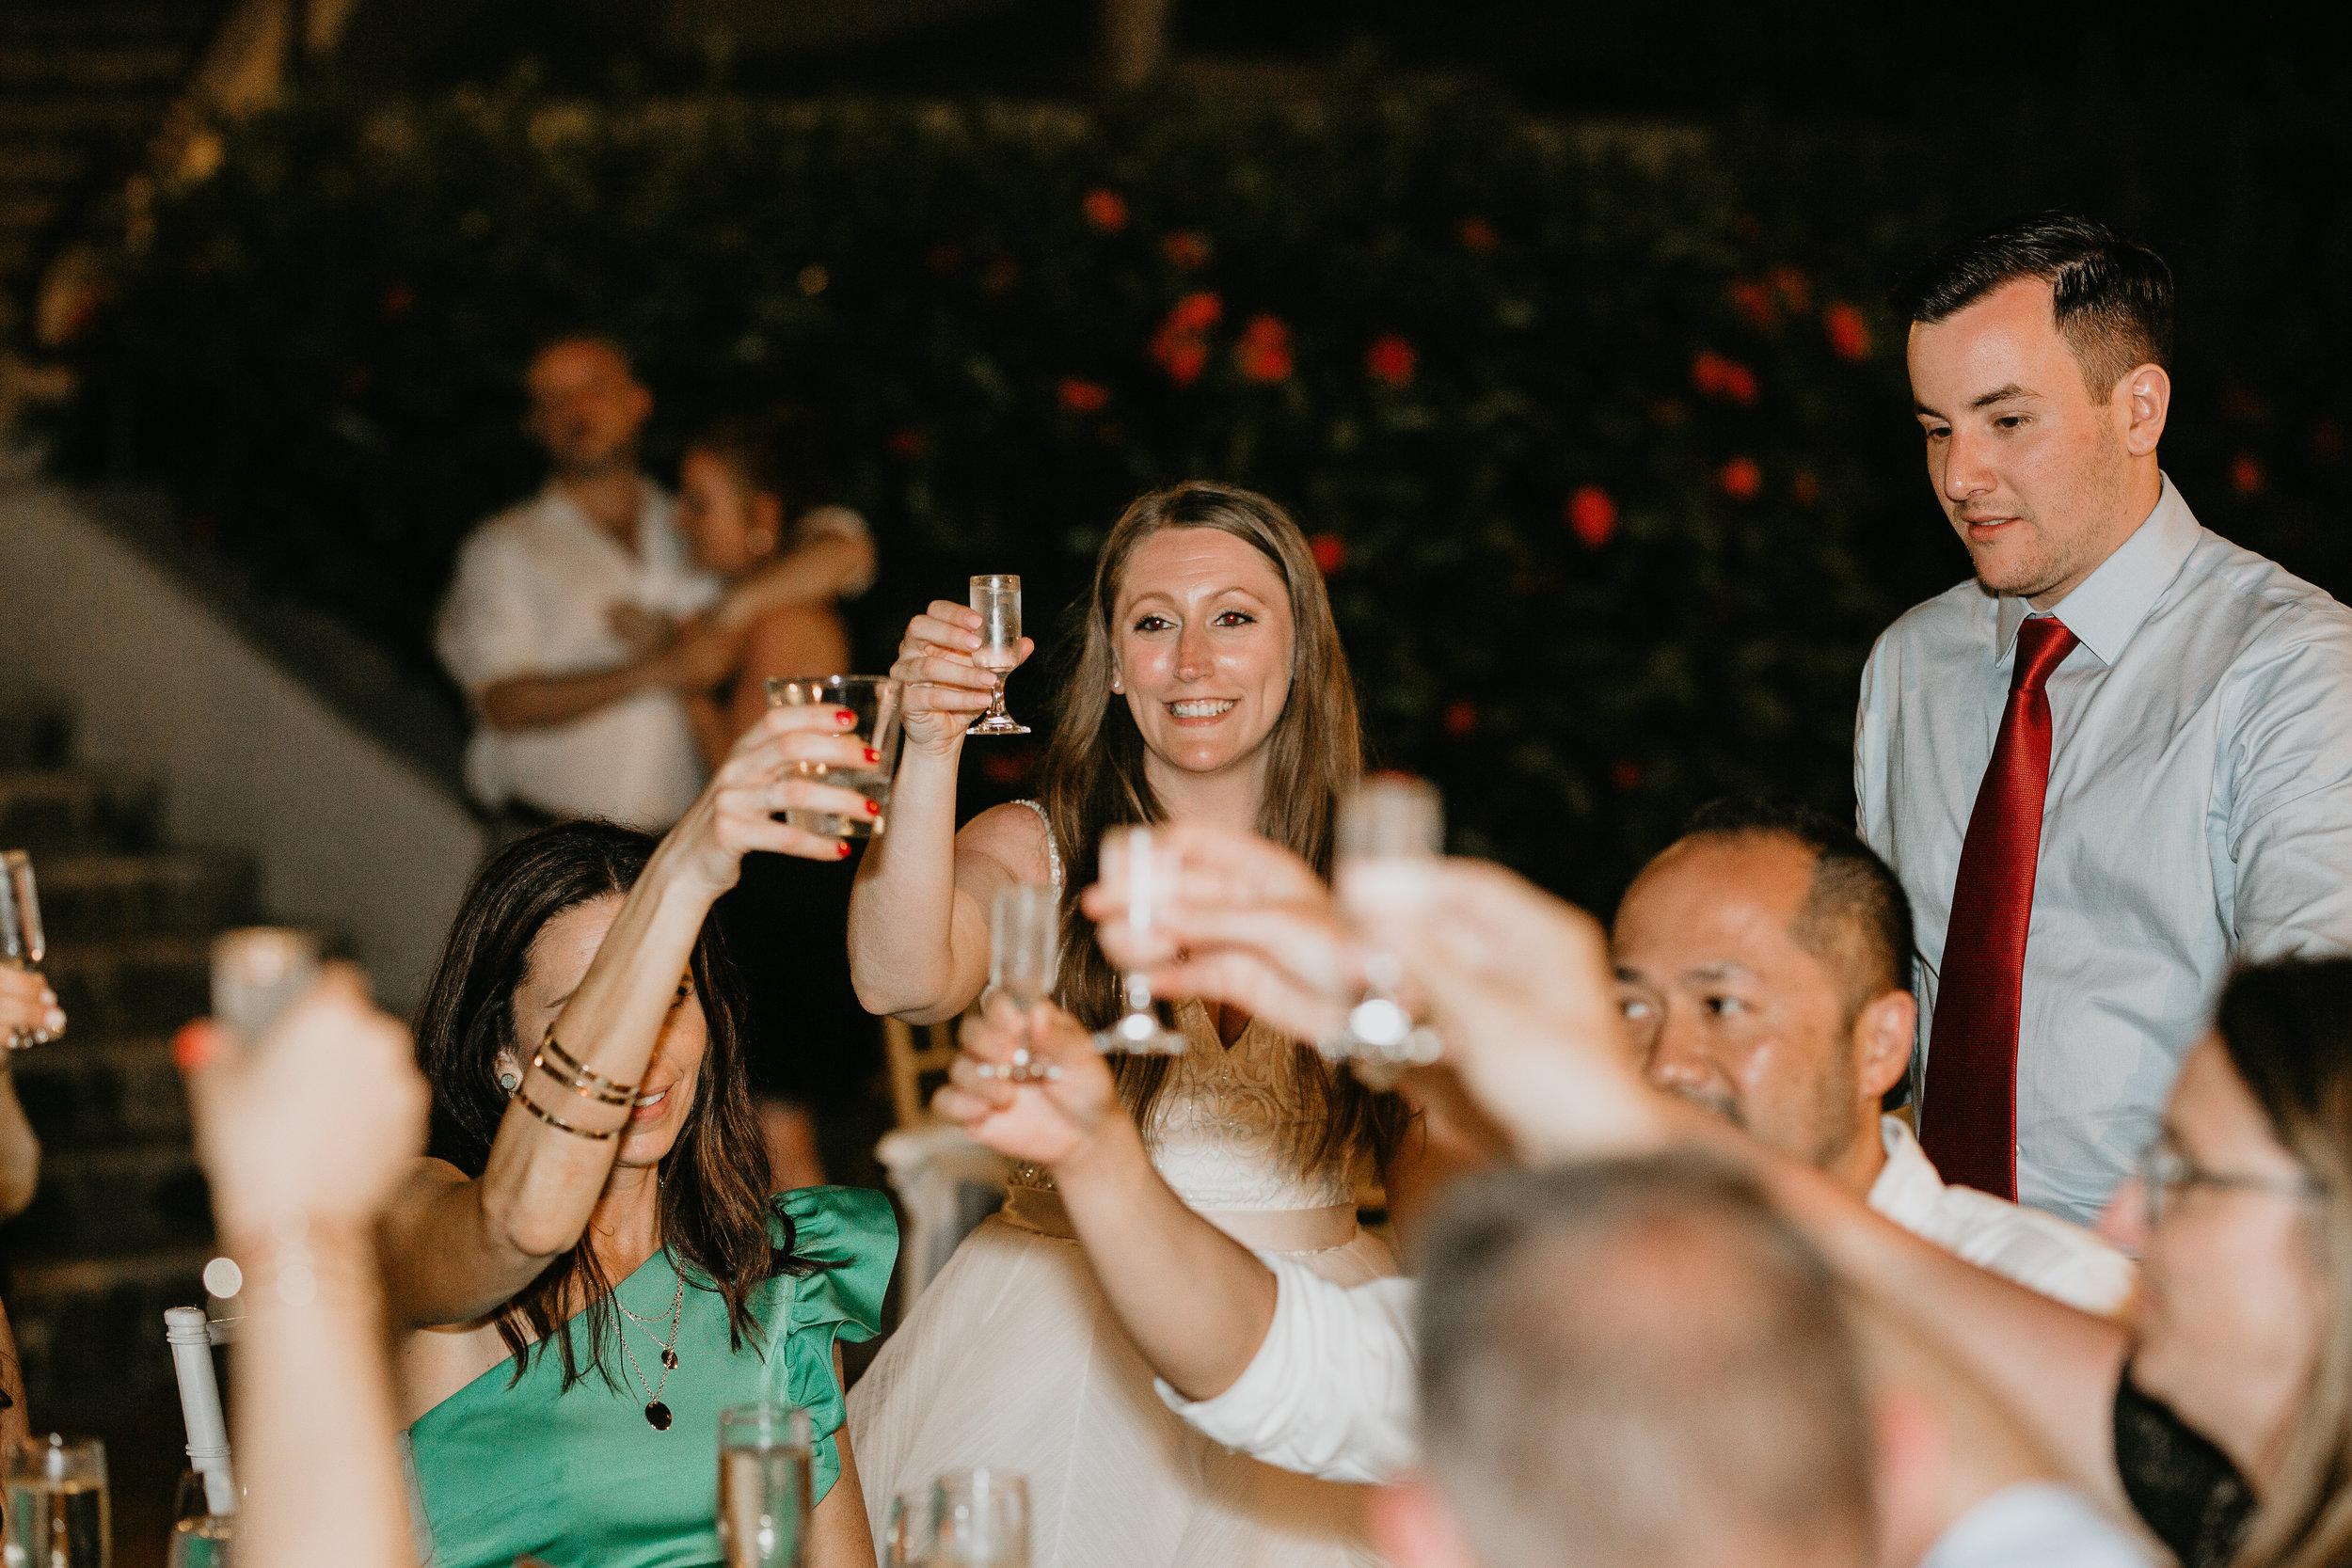 nicole-daacke-photography-destination-wedding-in-st-lucia-sandals-la-toc-intimate-island-wedding-carribean-elopement-photographer-chill-island-wedding-147.jpg